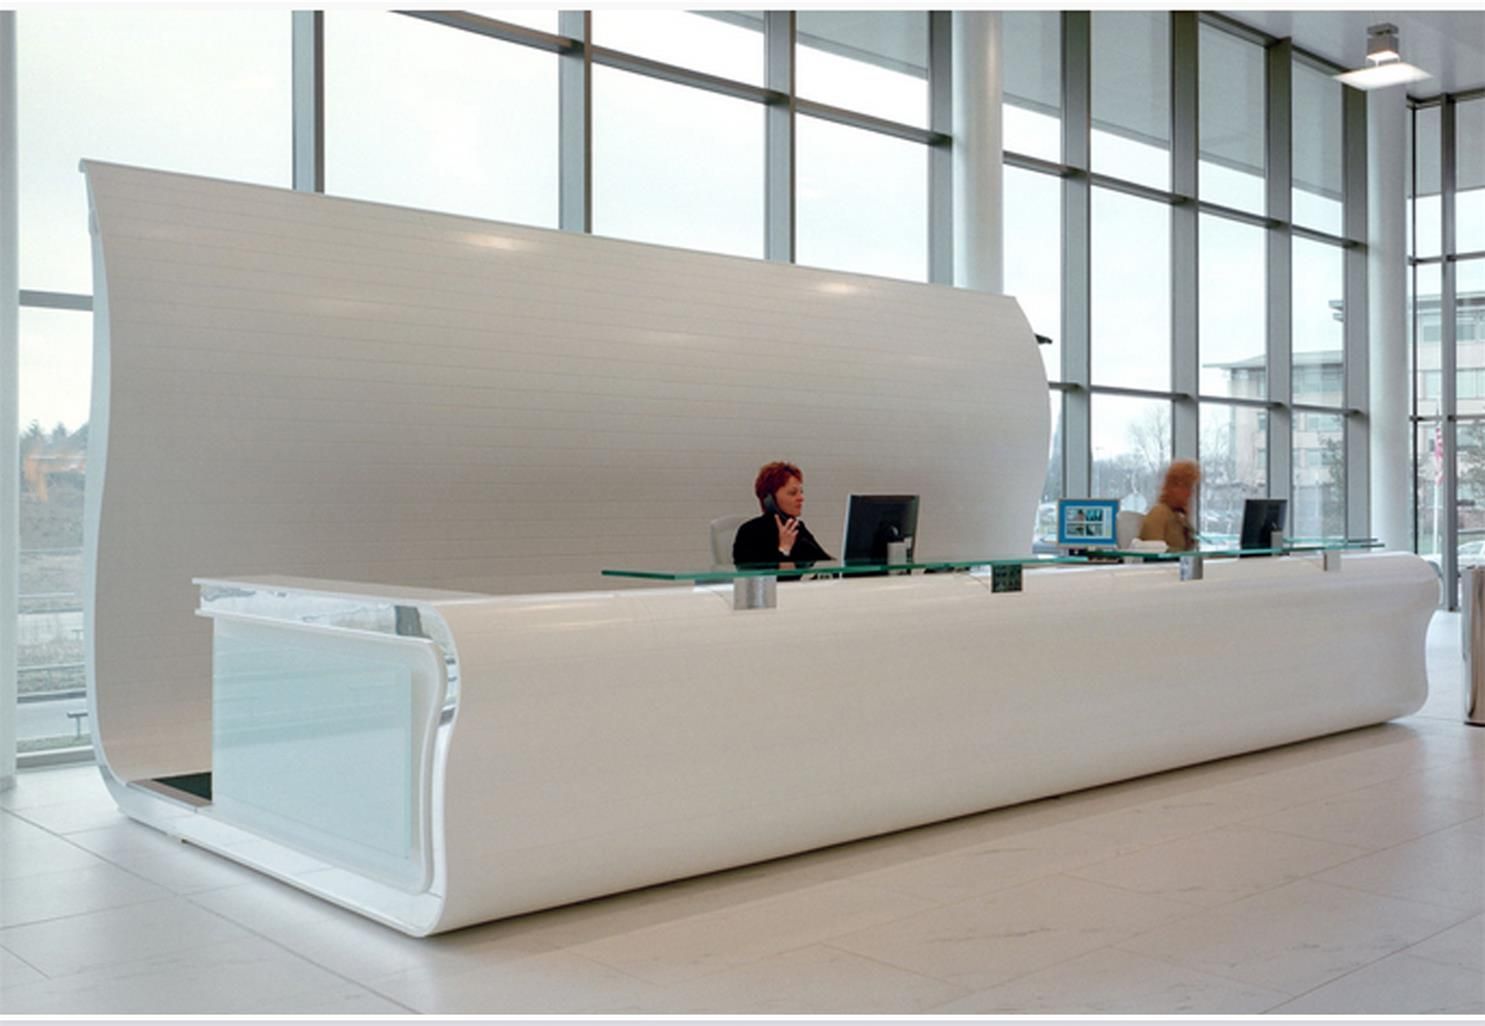 Large custom design recption information desk for lobby desk reception office for Information on interior design